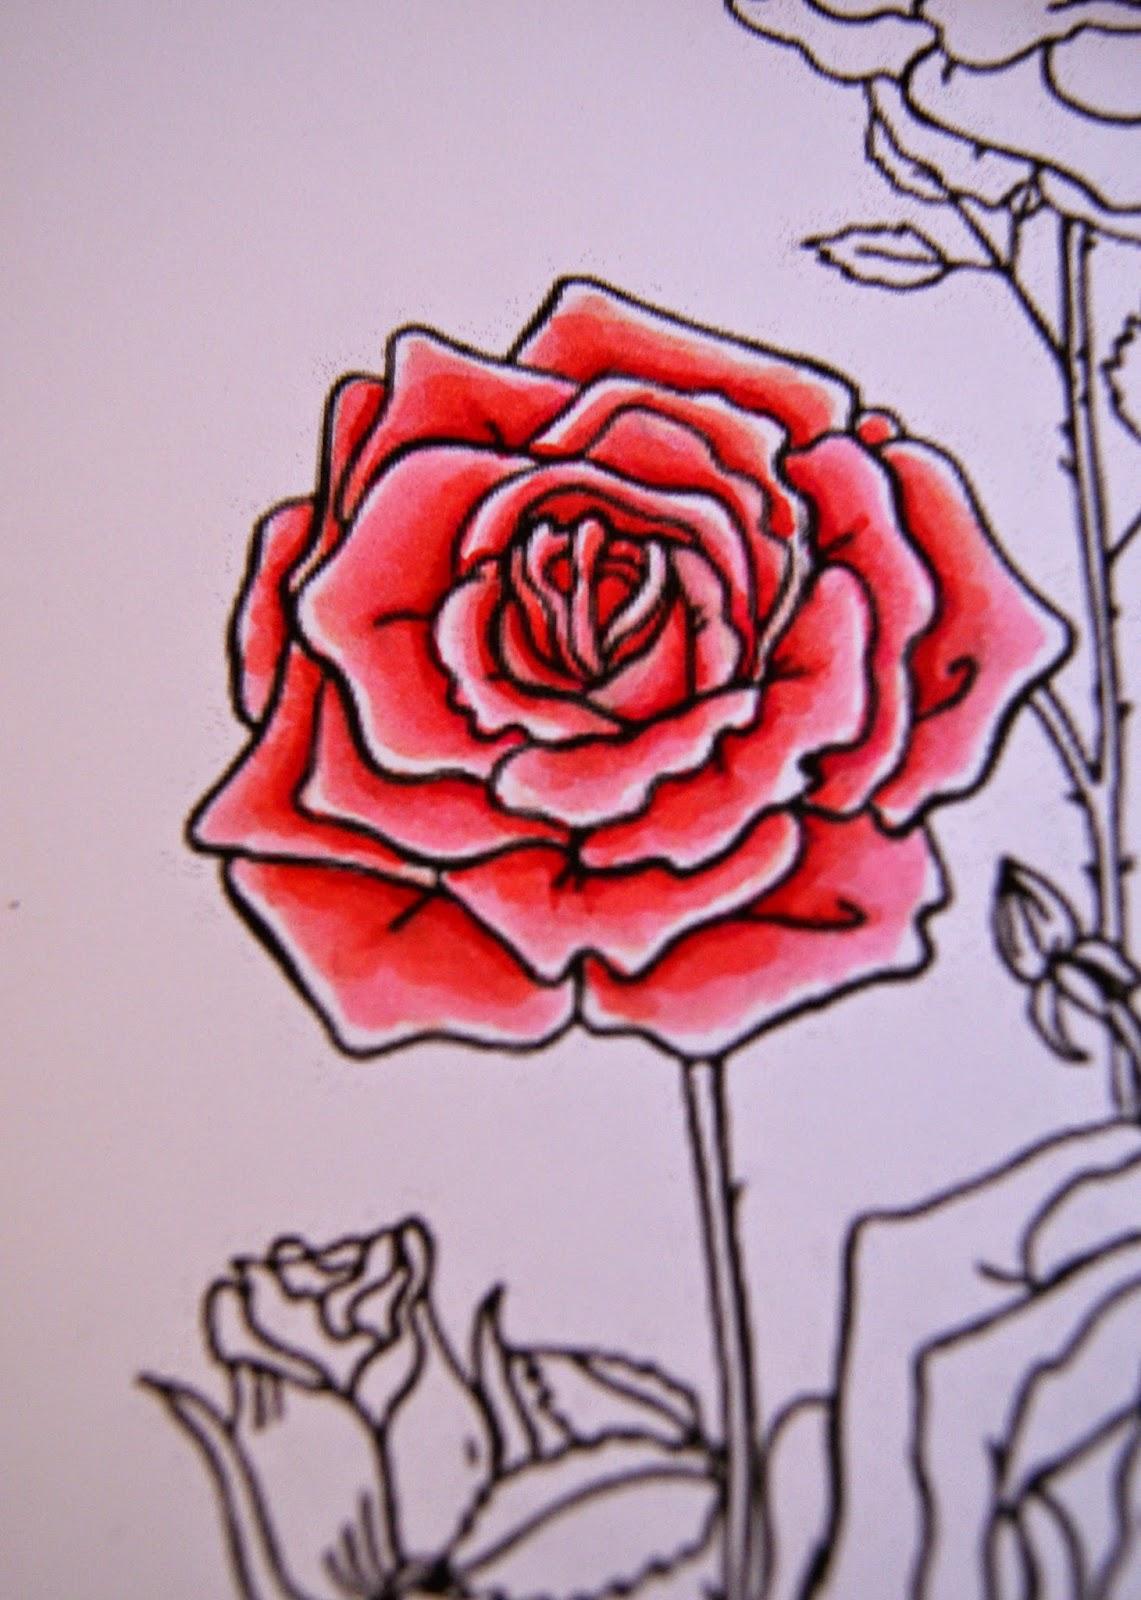 Imagenes De Rosas Para Dibujar - 3 formas de dibujar una rosa wikiHow